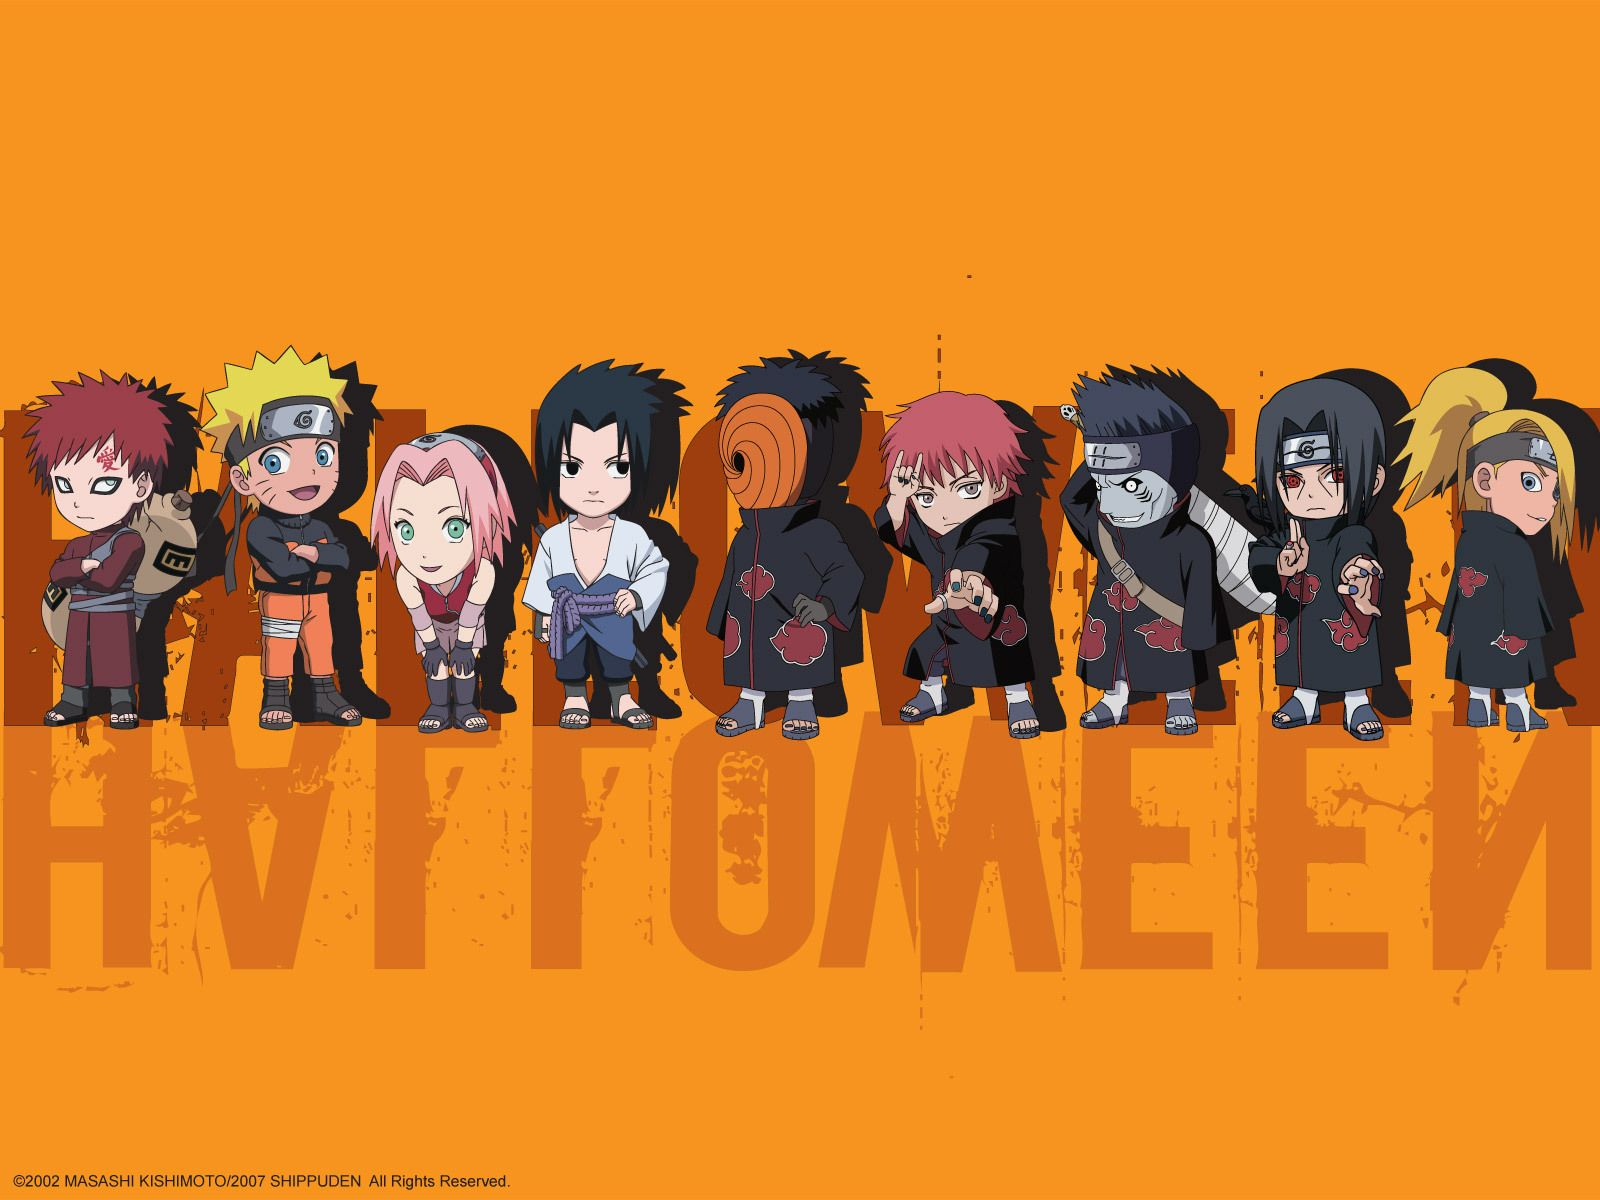 Top Wallpaper Naruto Cartoon - 4a64fff9d47132b3234e751c5a7b3489  Photograph_297261.jpg